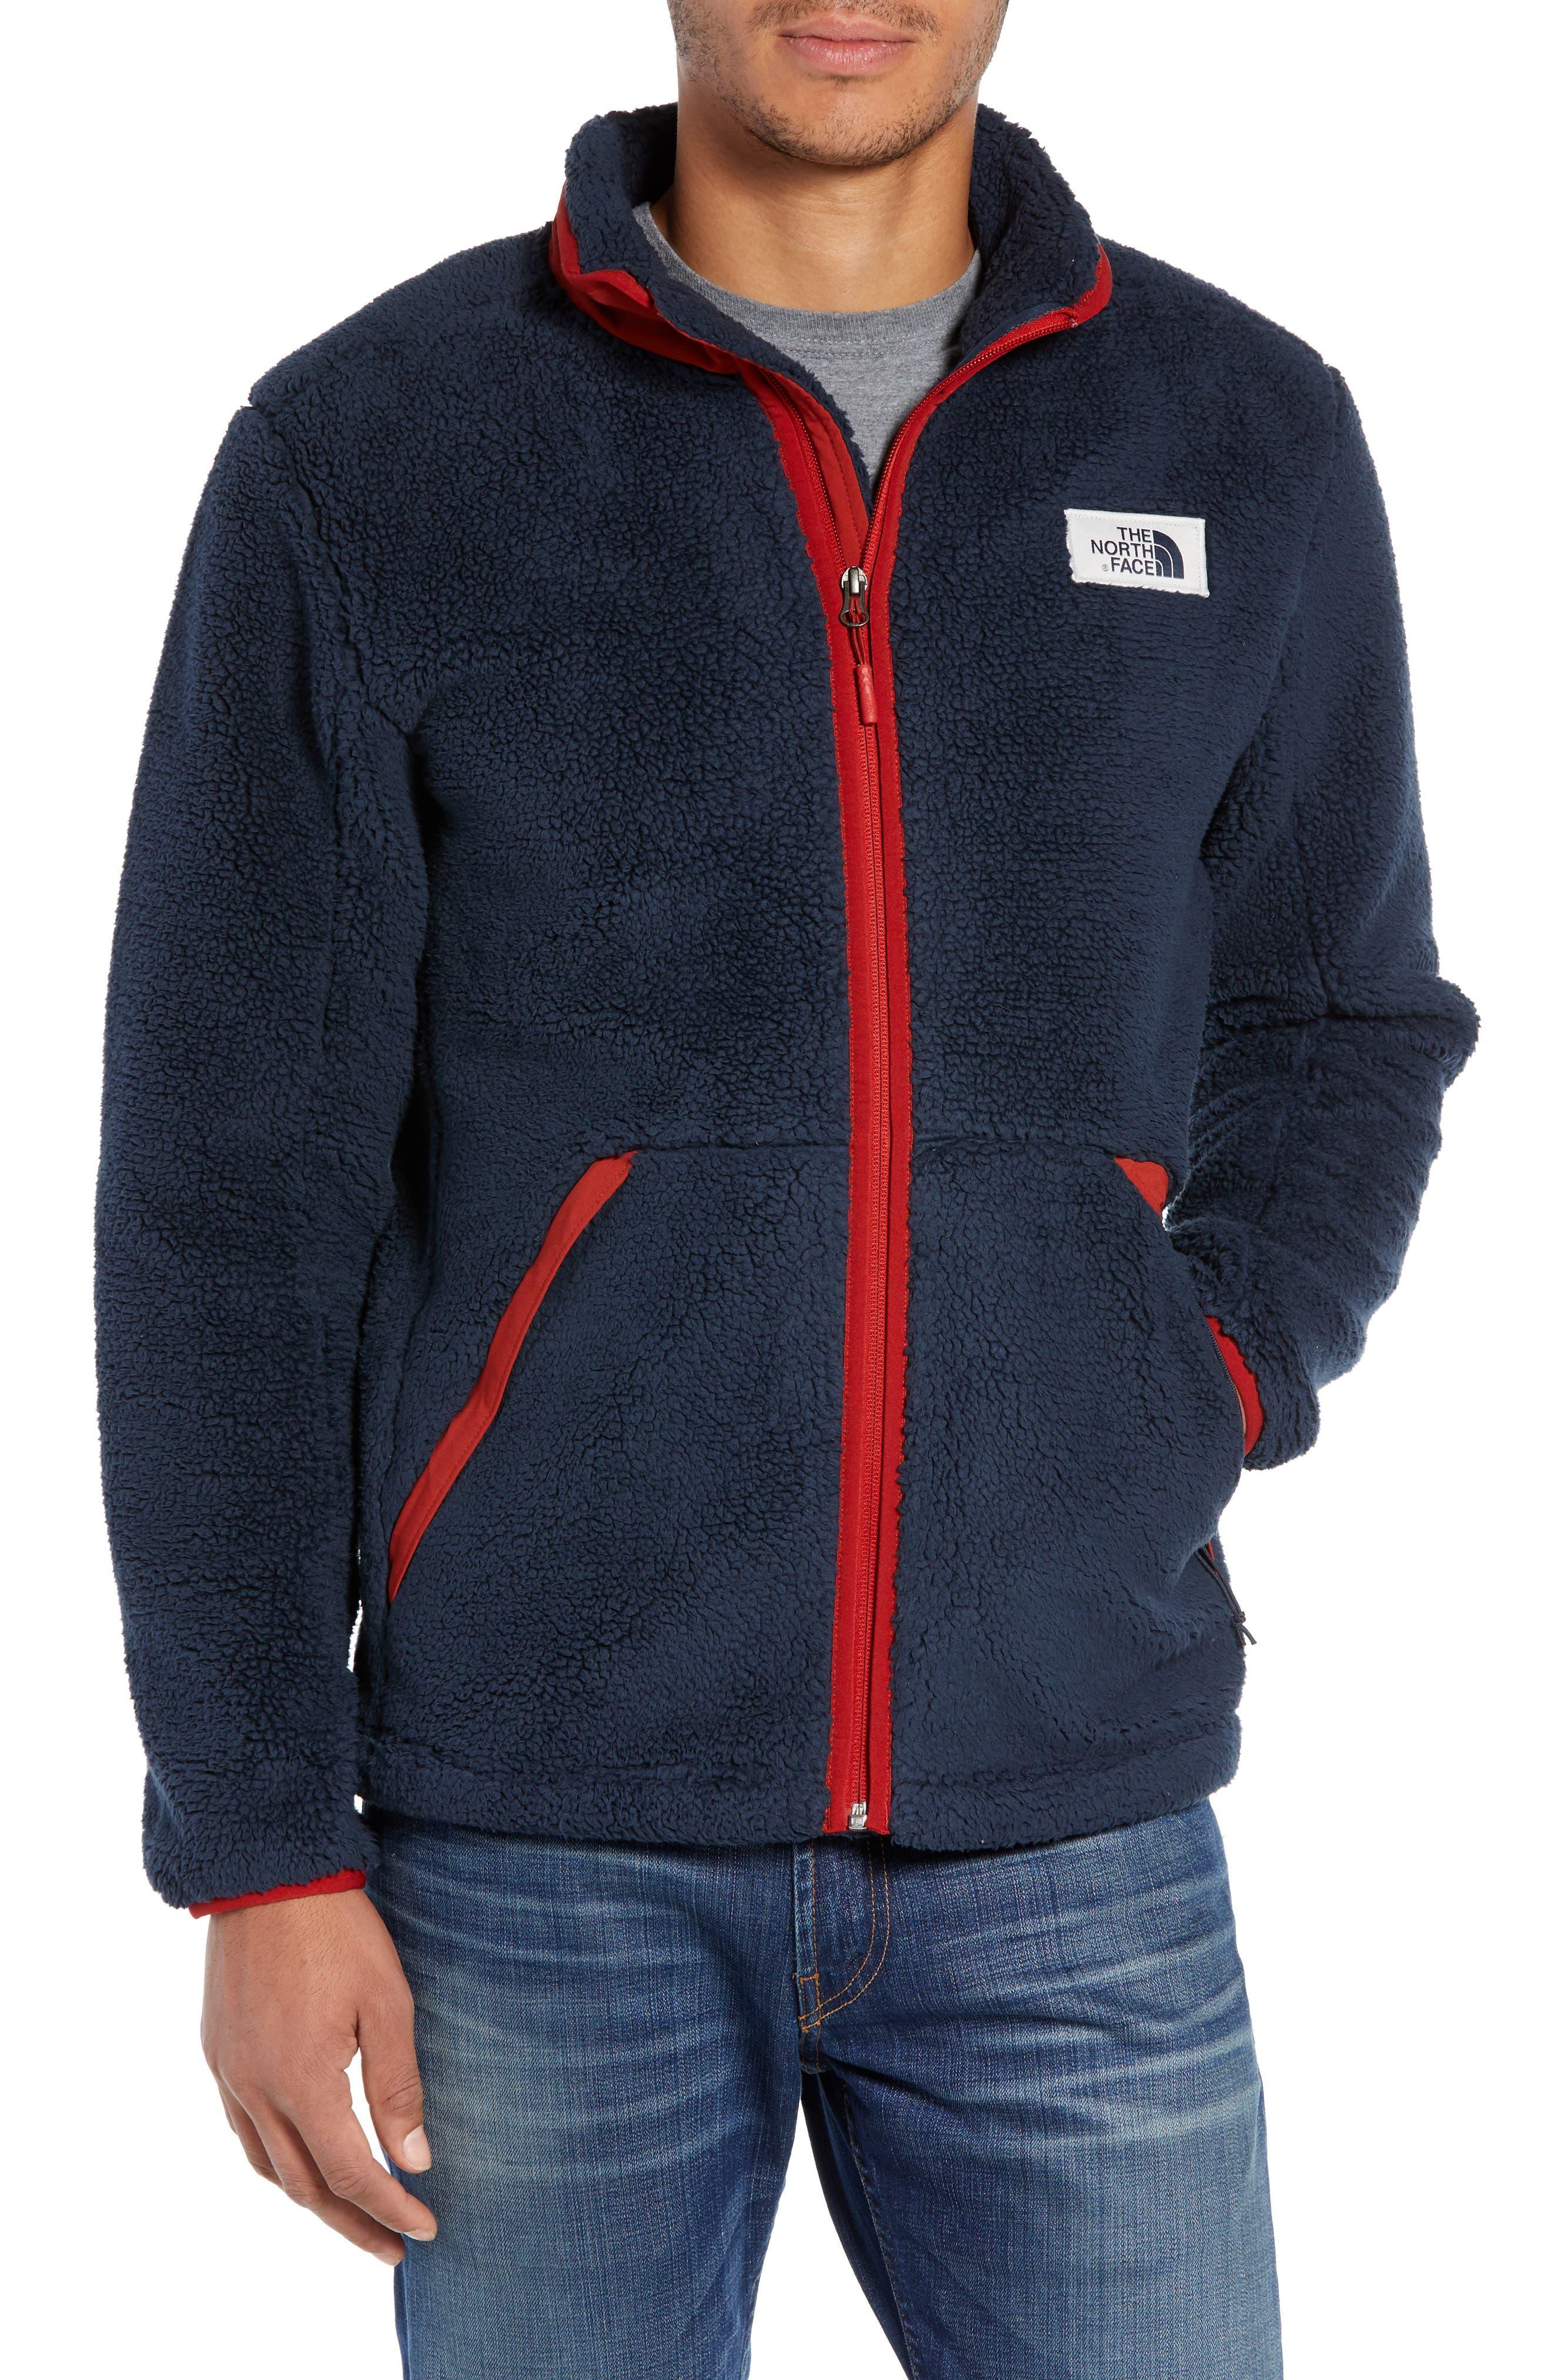 THE NORTH FACE Campshire Zip Fleece Jacket in Urban Navy/ Caldera Red